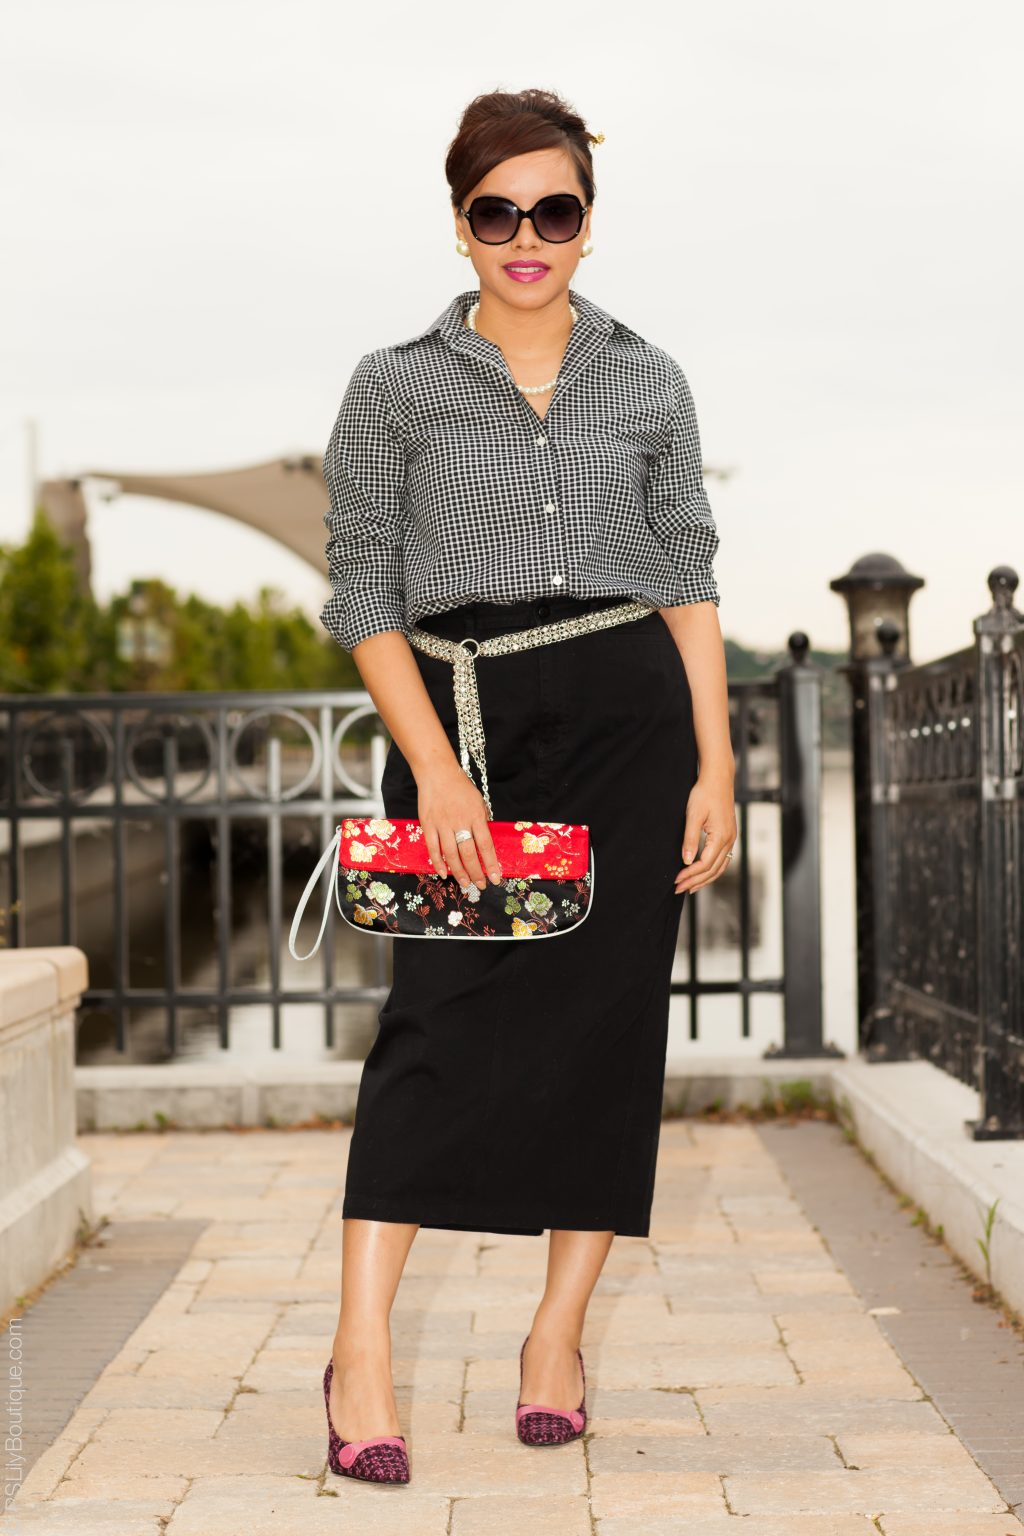 instagram-pslilyboutique-la-fashion-blogger-blog-chaps-gingham-shirt-black-rafaella-midi-skirt